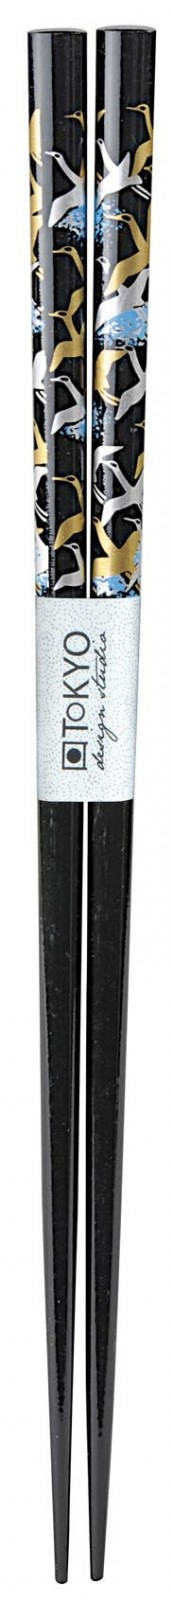 Chopstick Crane Black - 23 cm